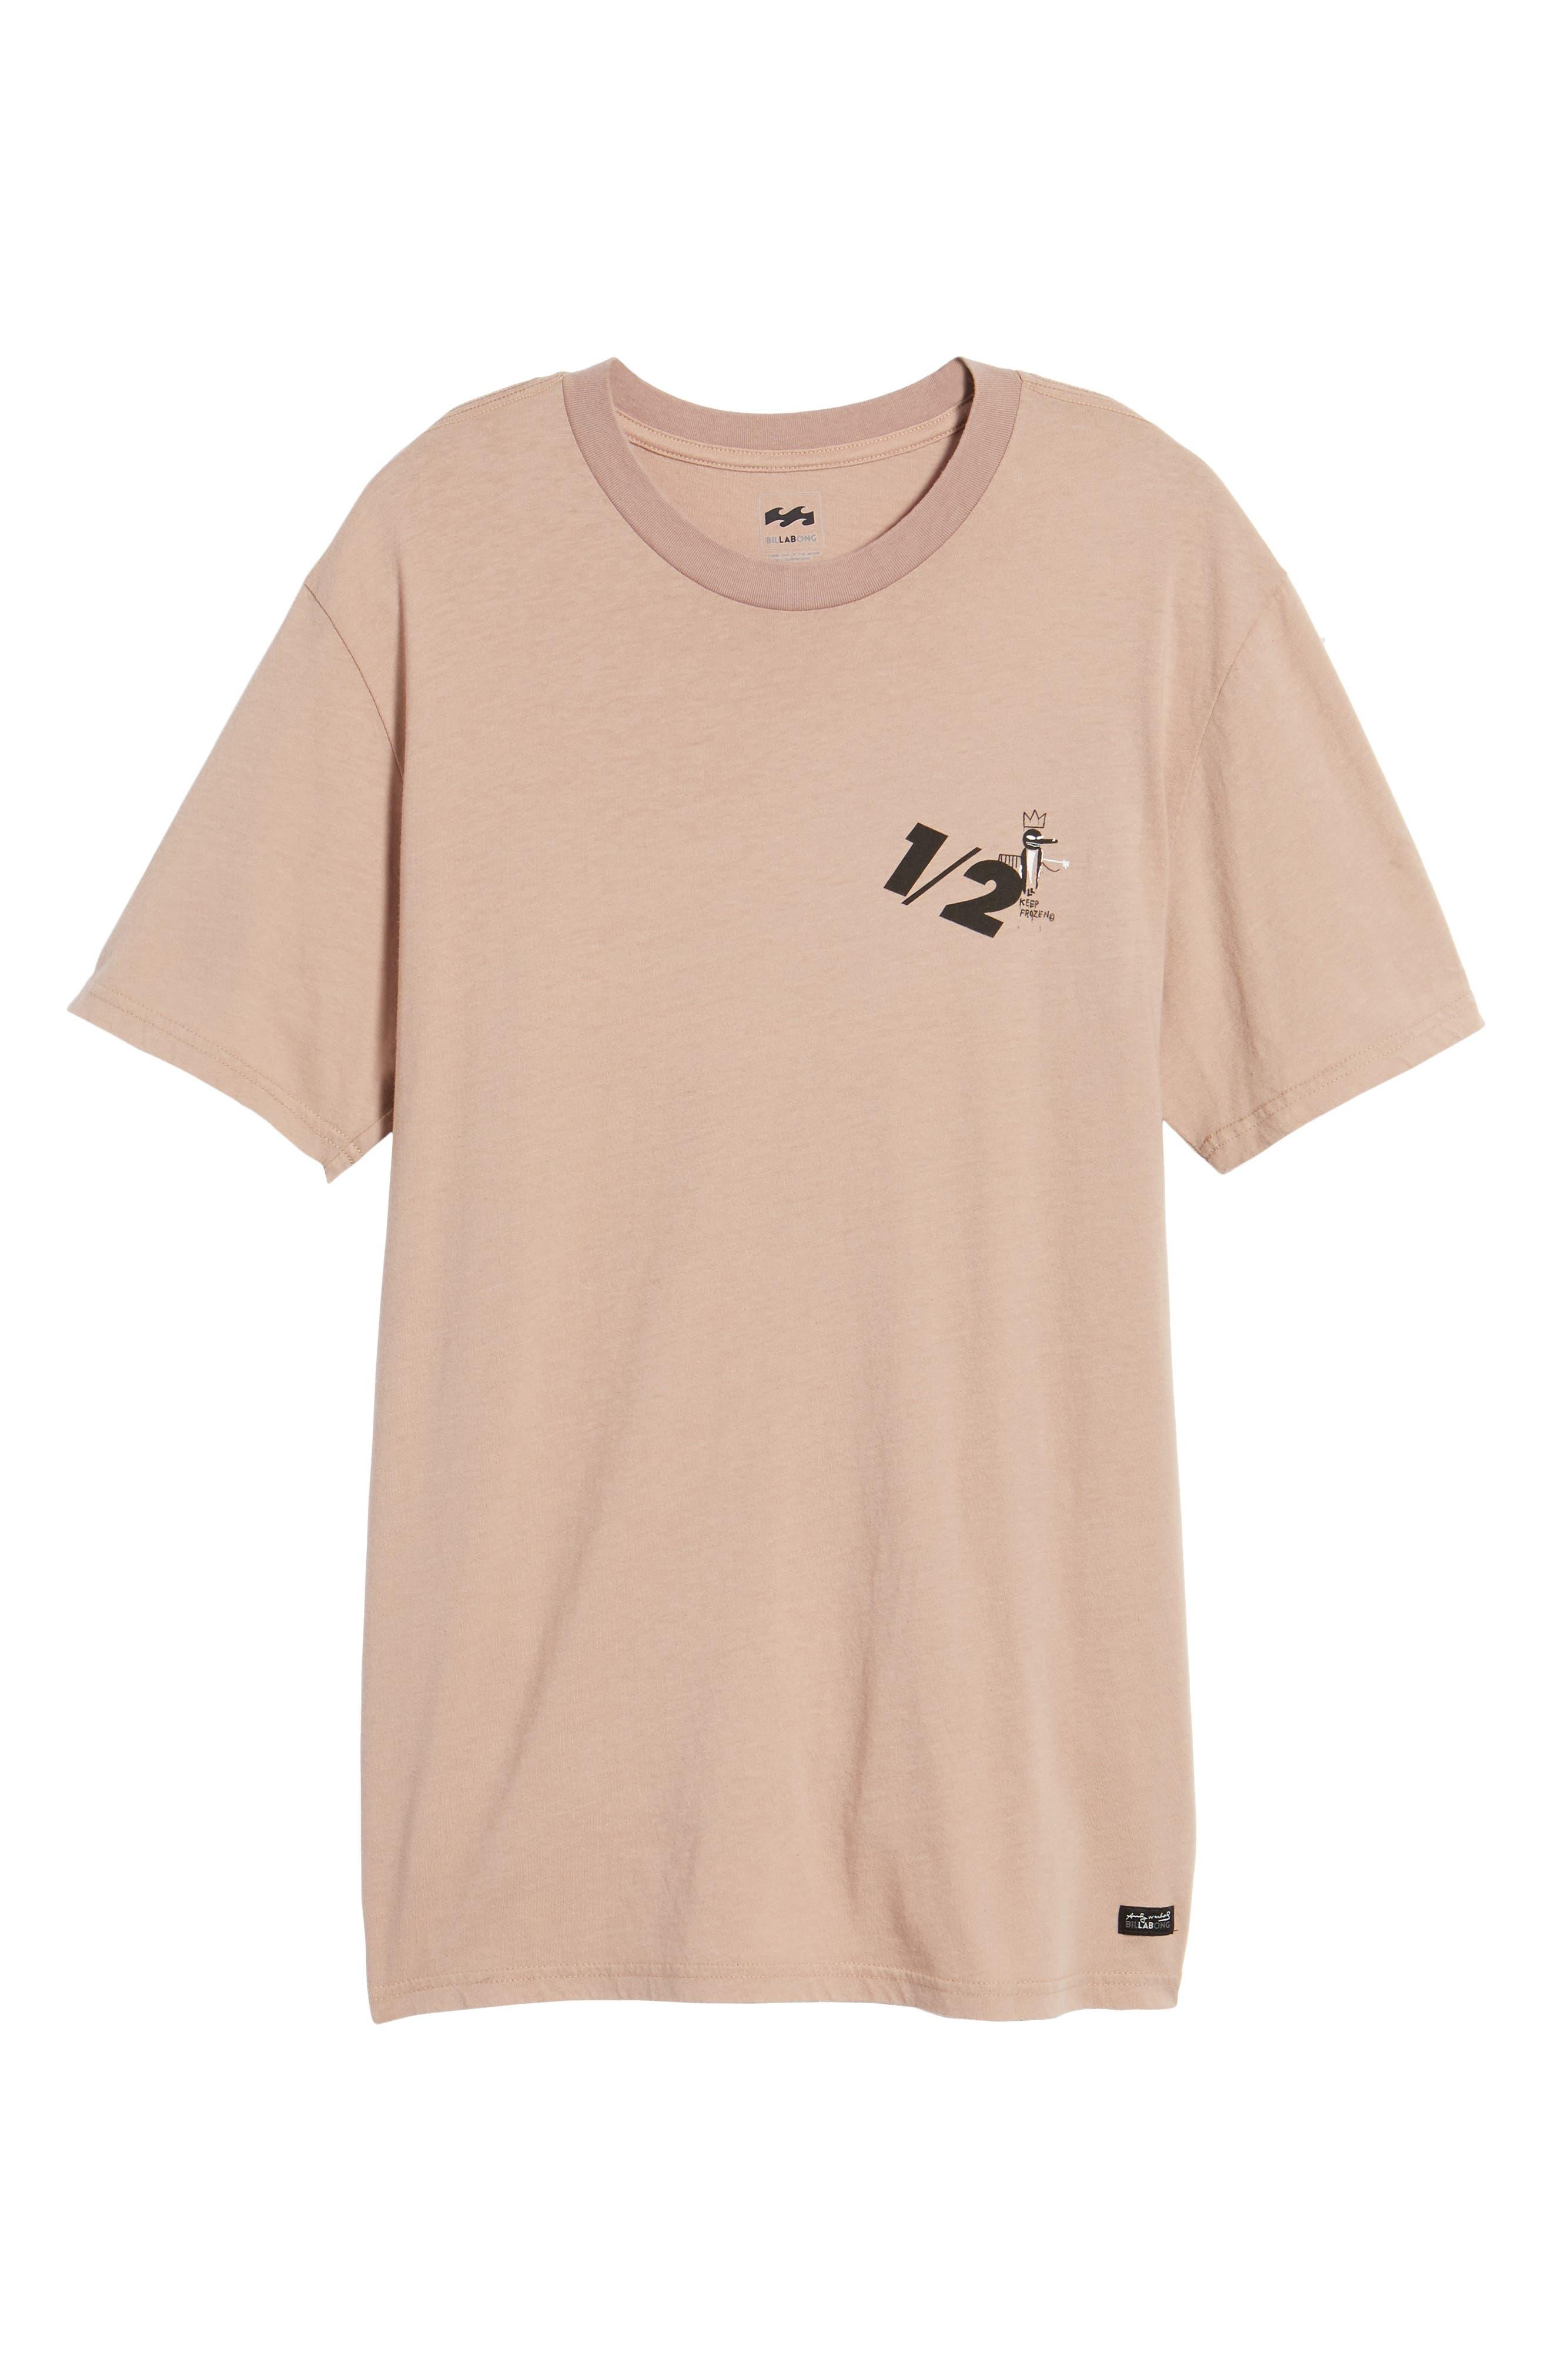 x Warhol Half T-Shirt,                             Alternate thumbnail 6, color,                             654